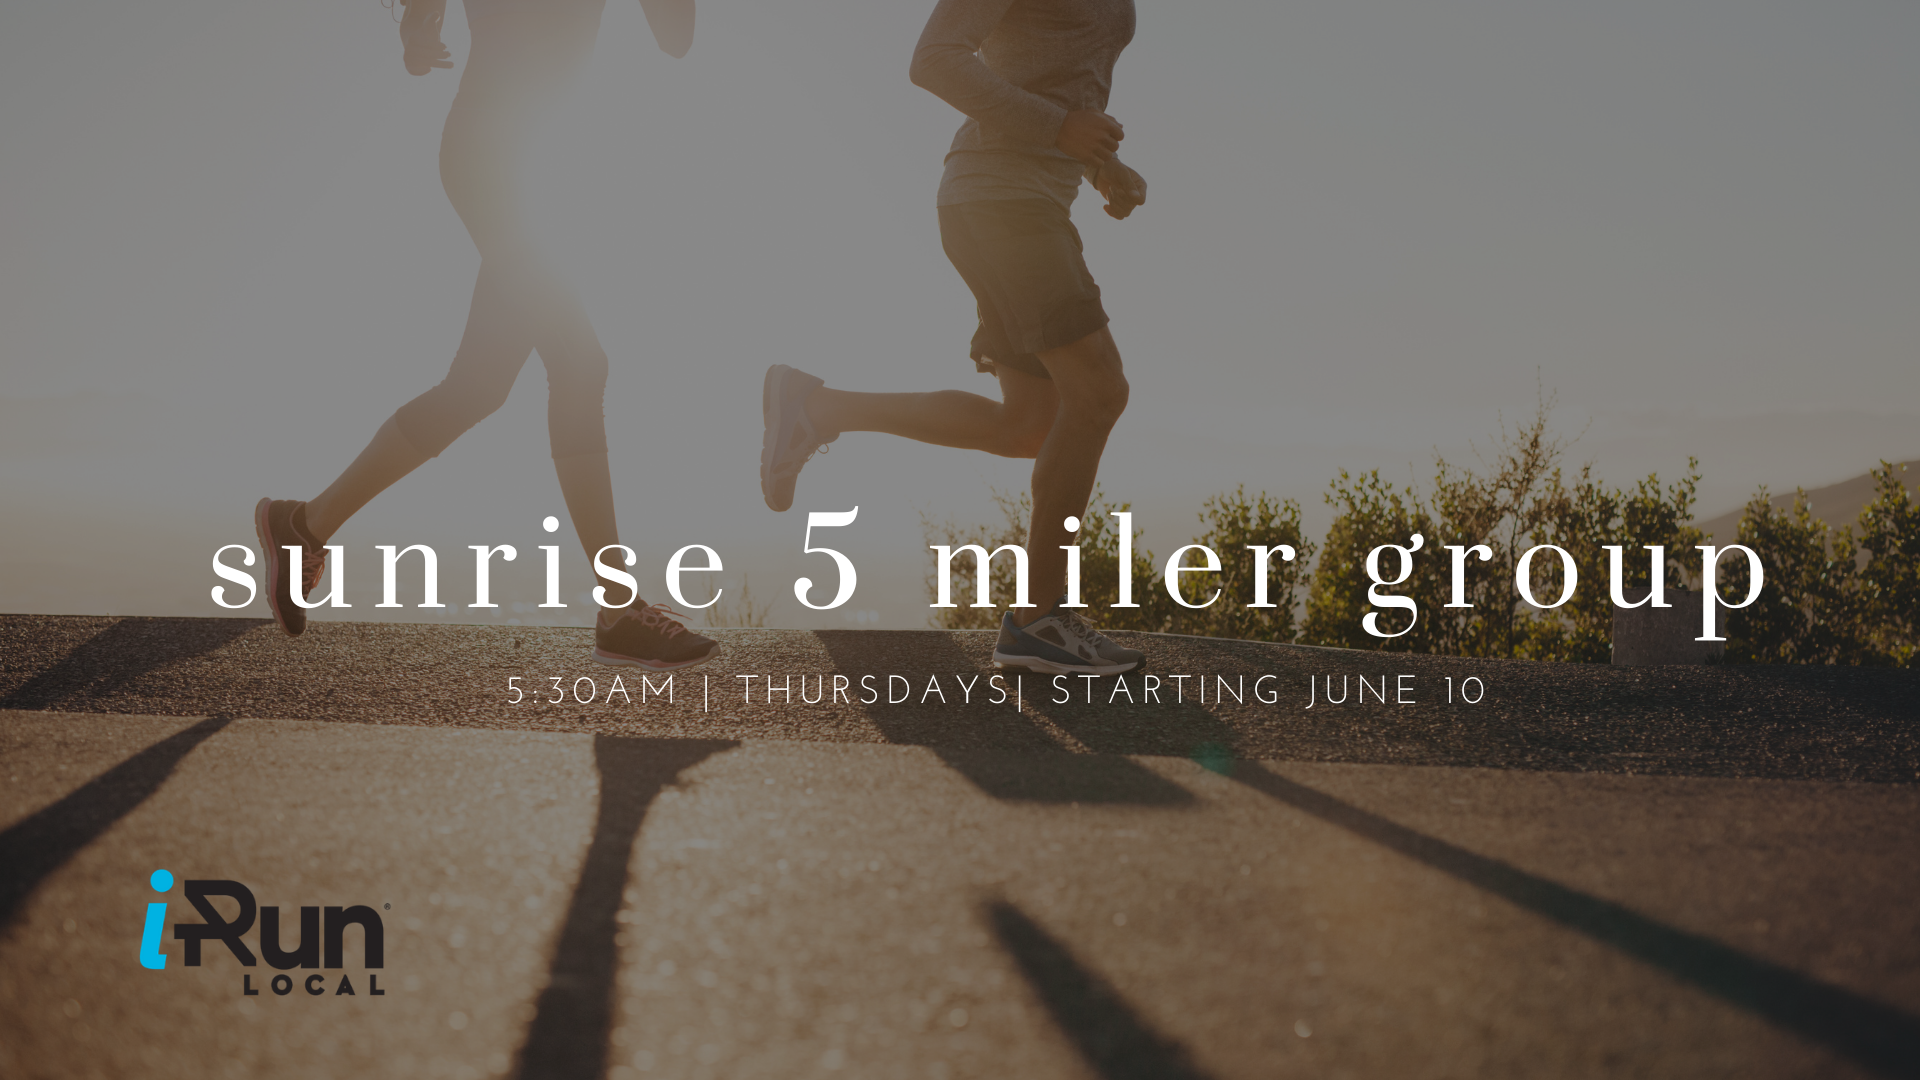 Sunrise 5 Miler – Thursdays at iRun LOCAL – 5:30AM